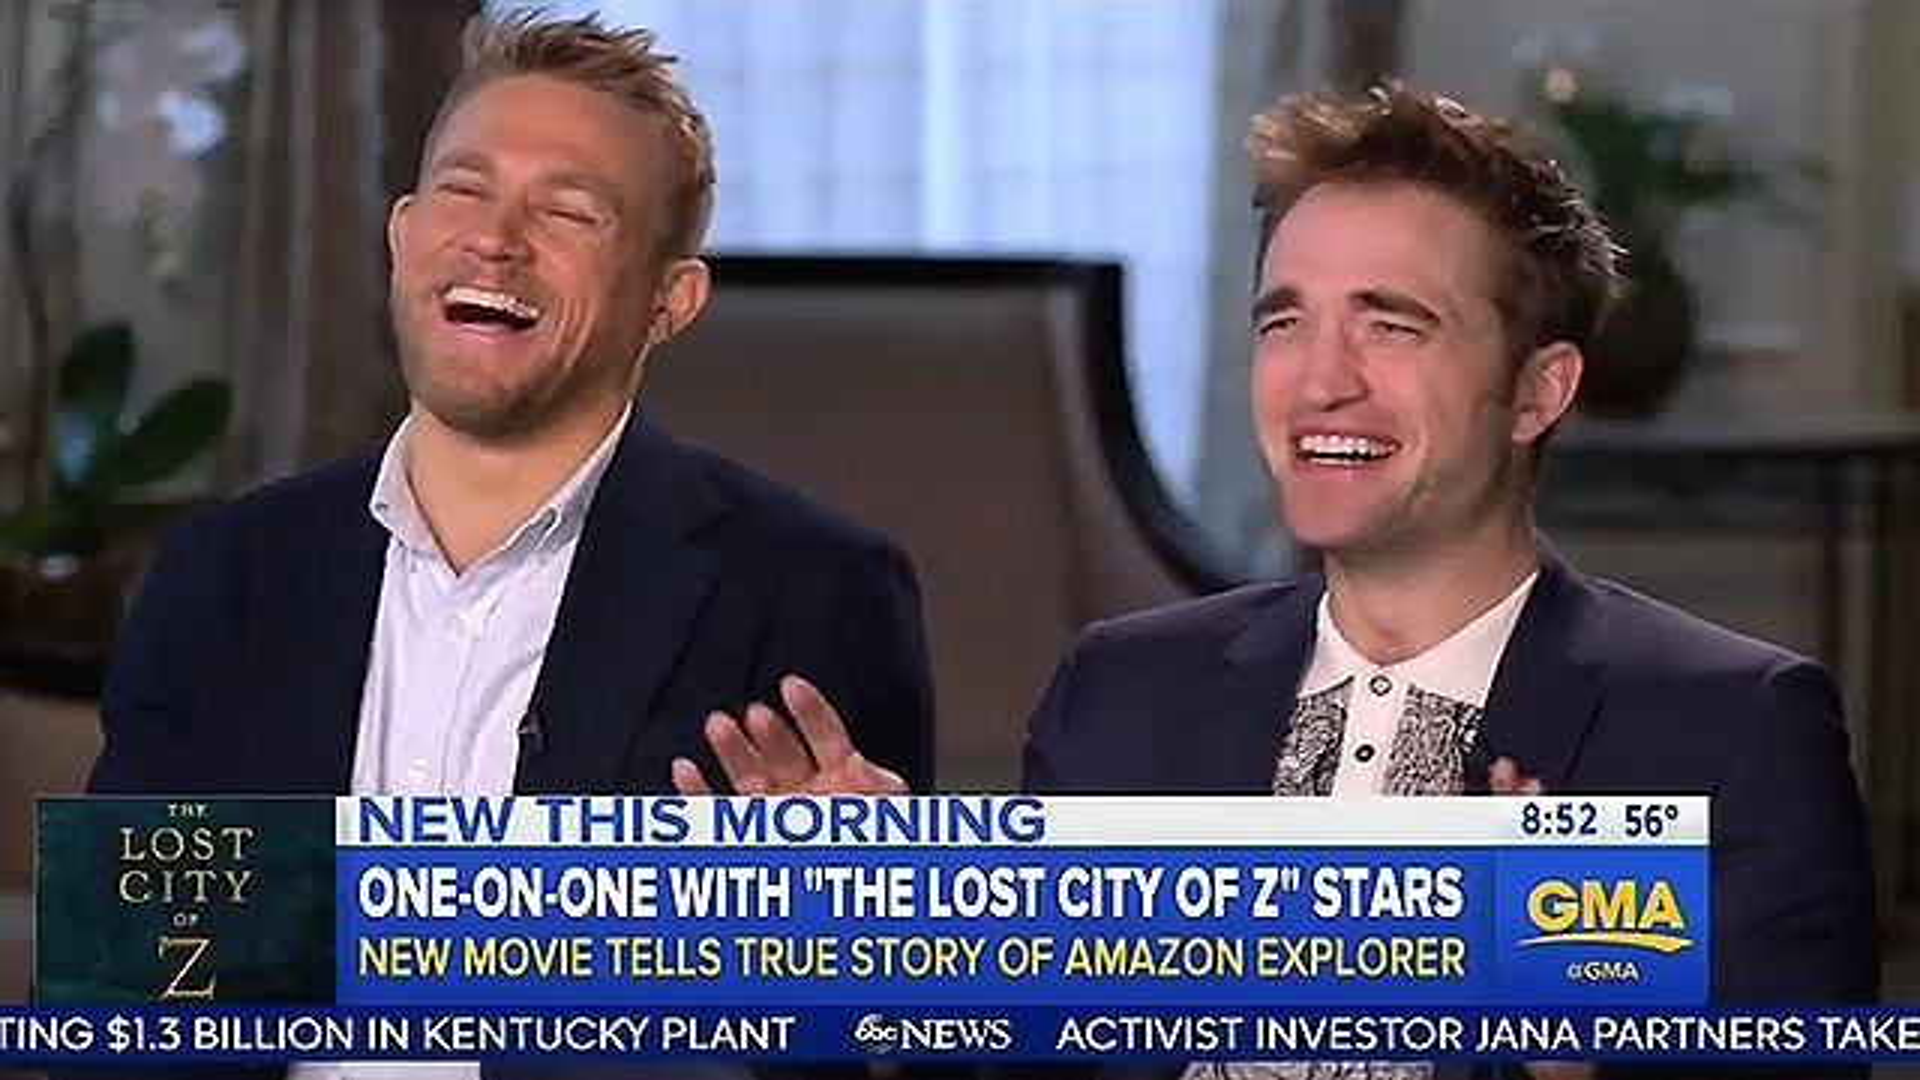 Charlie-Hunnam-Robert-Pattinson-Good-Morning-America